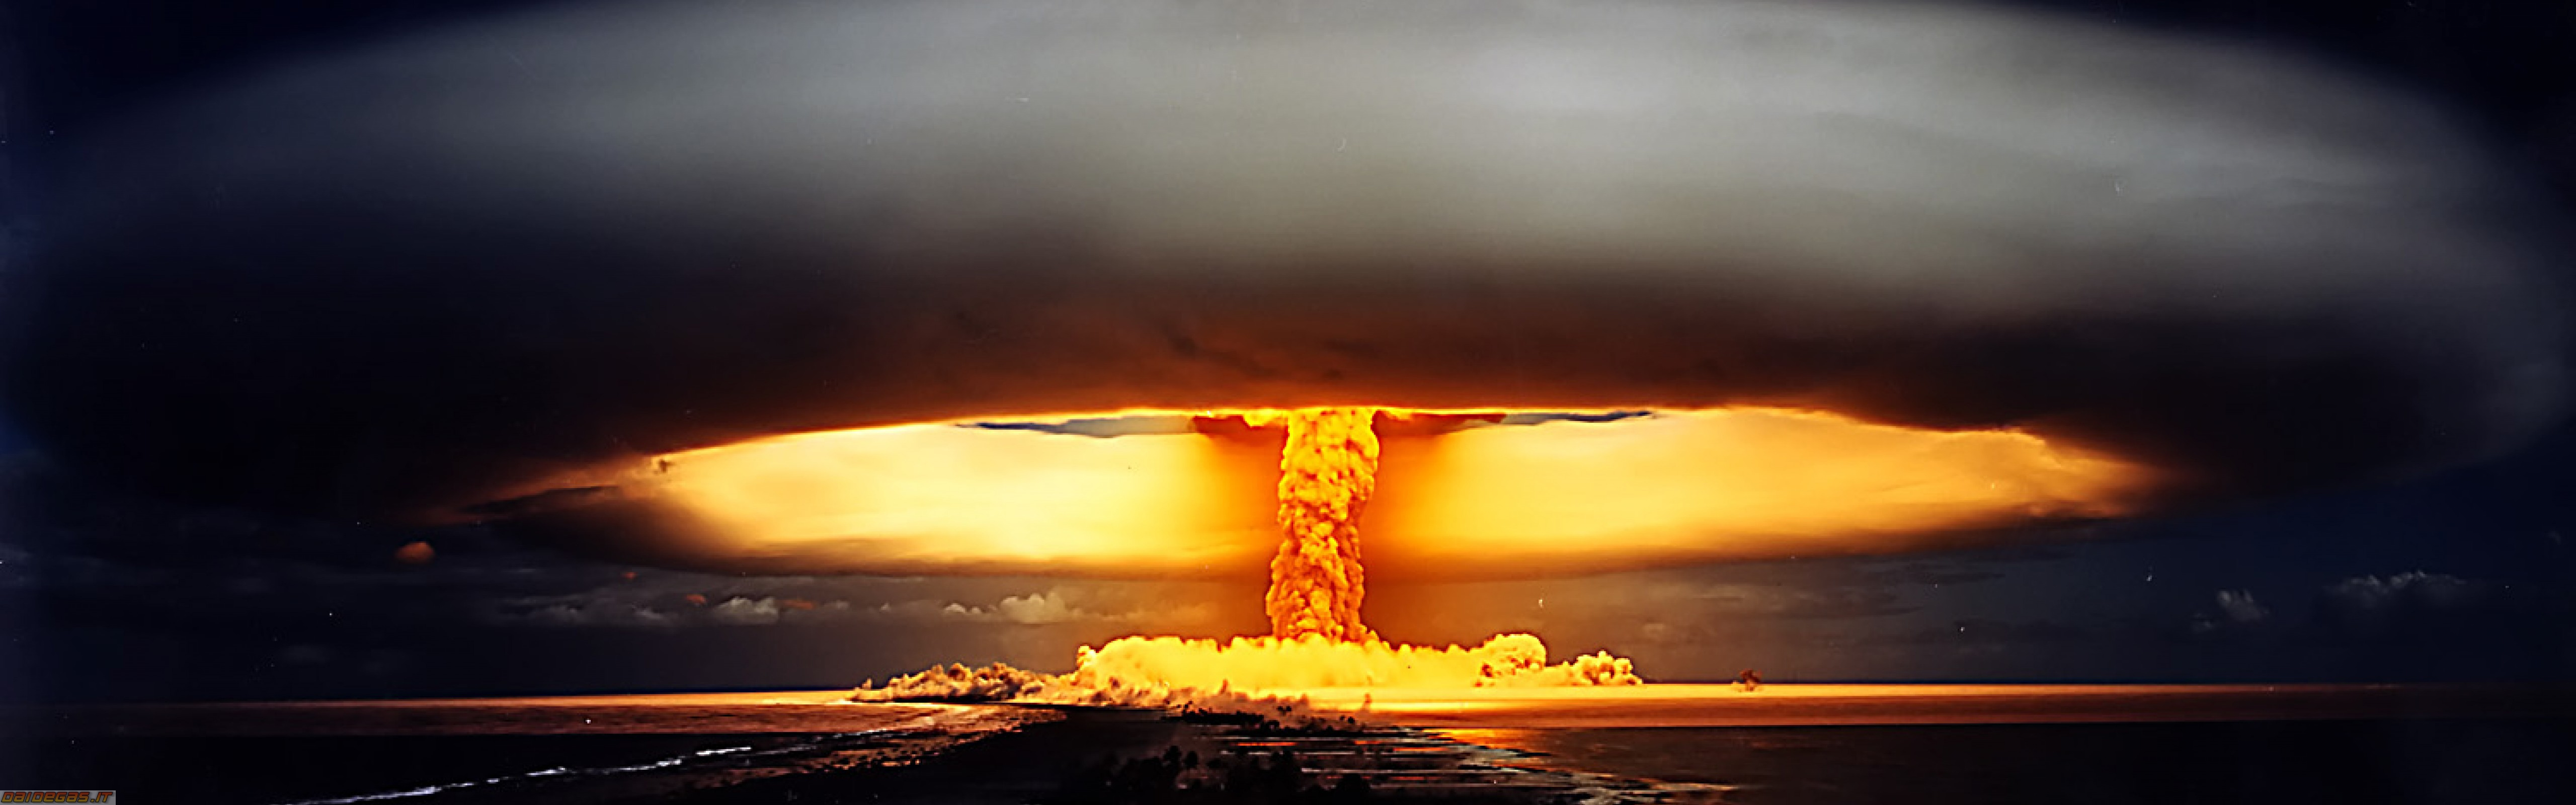 fungo_atomico